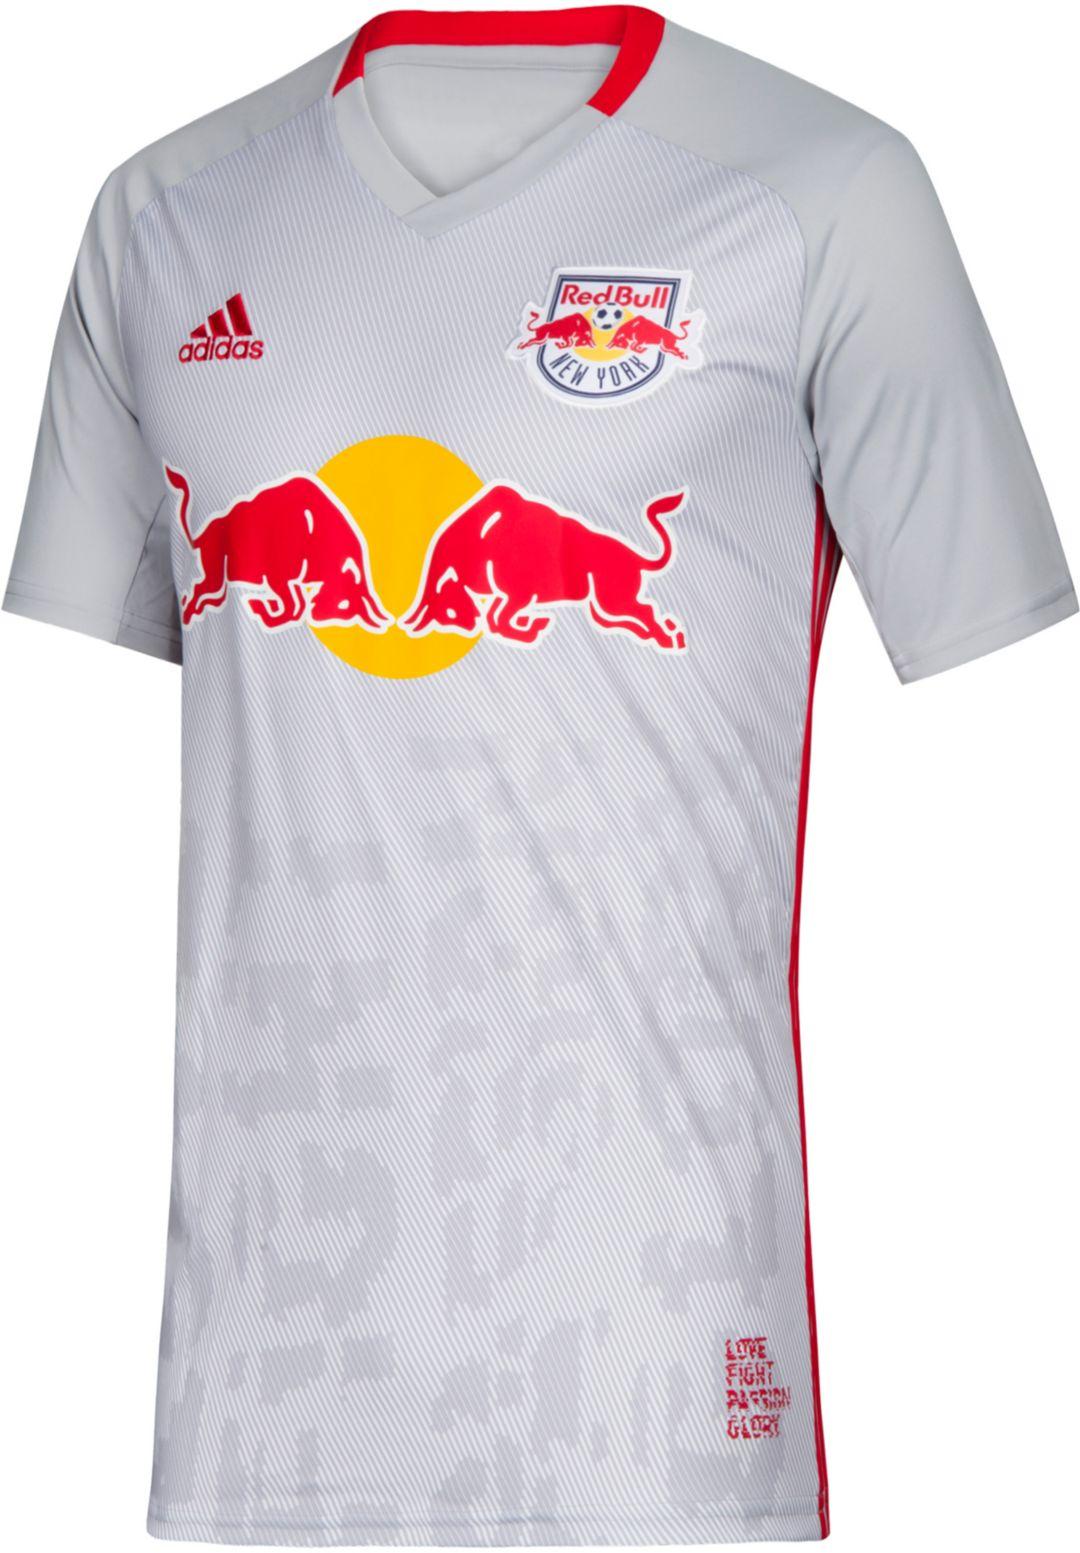 100% authentic e5fad 01dab adidas Men's New York Red Bulls Primary Replica Jersey